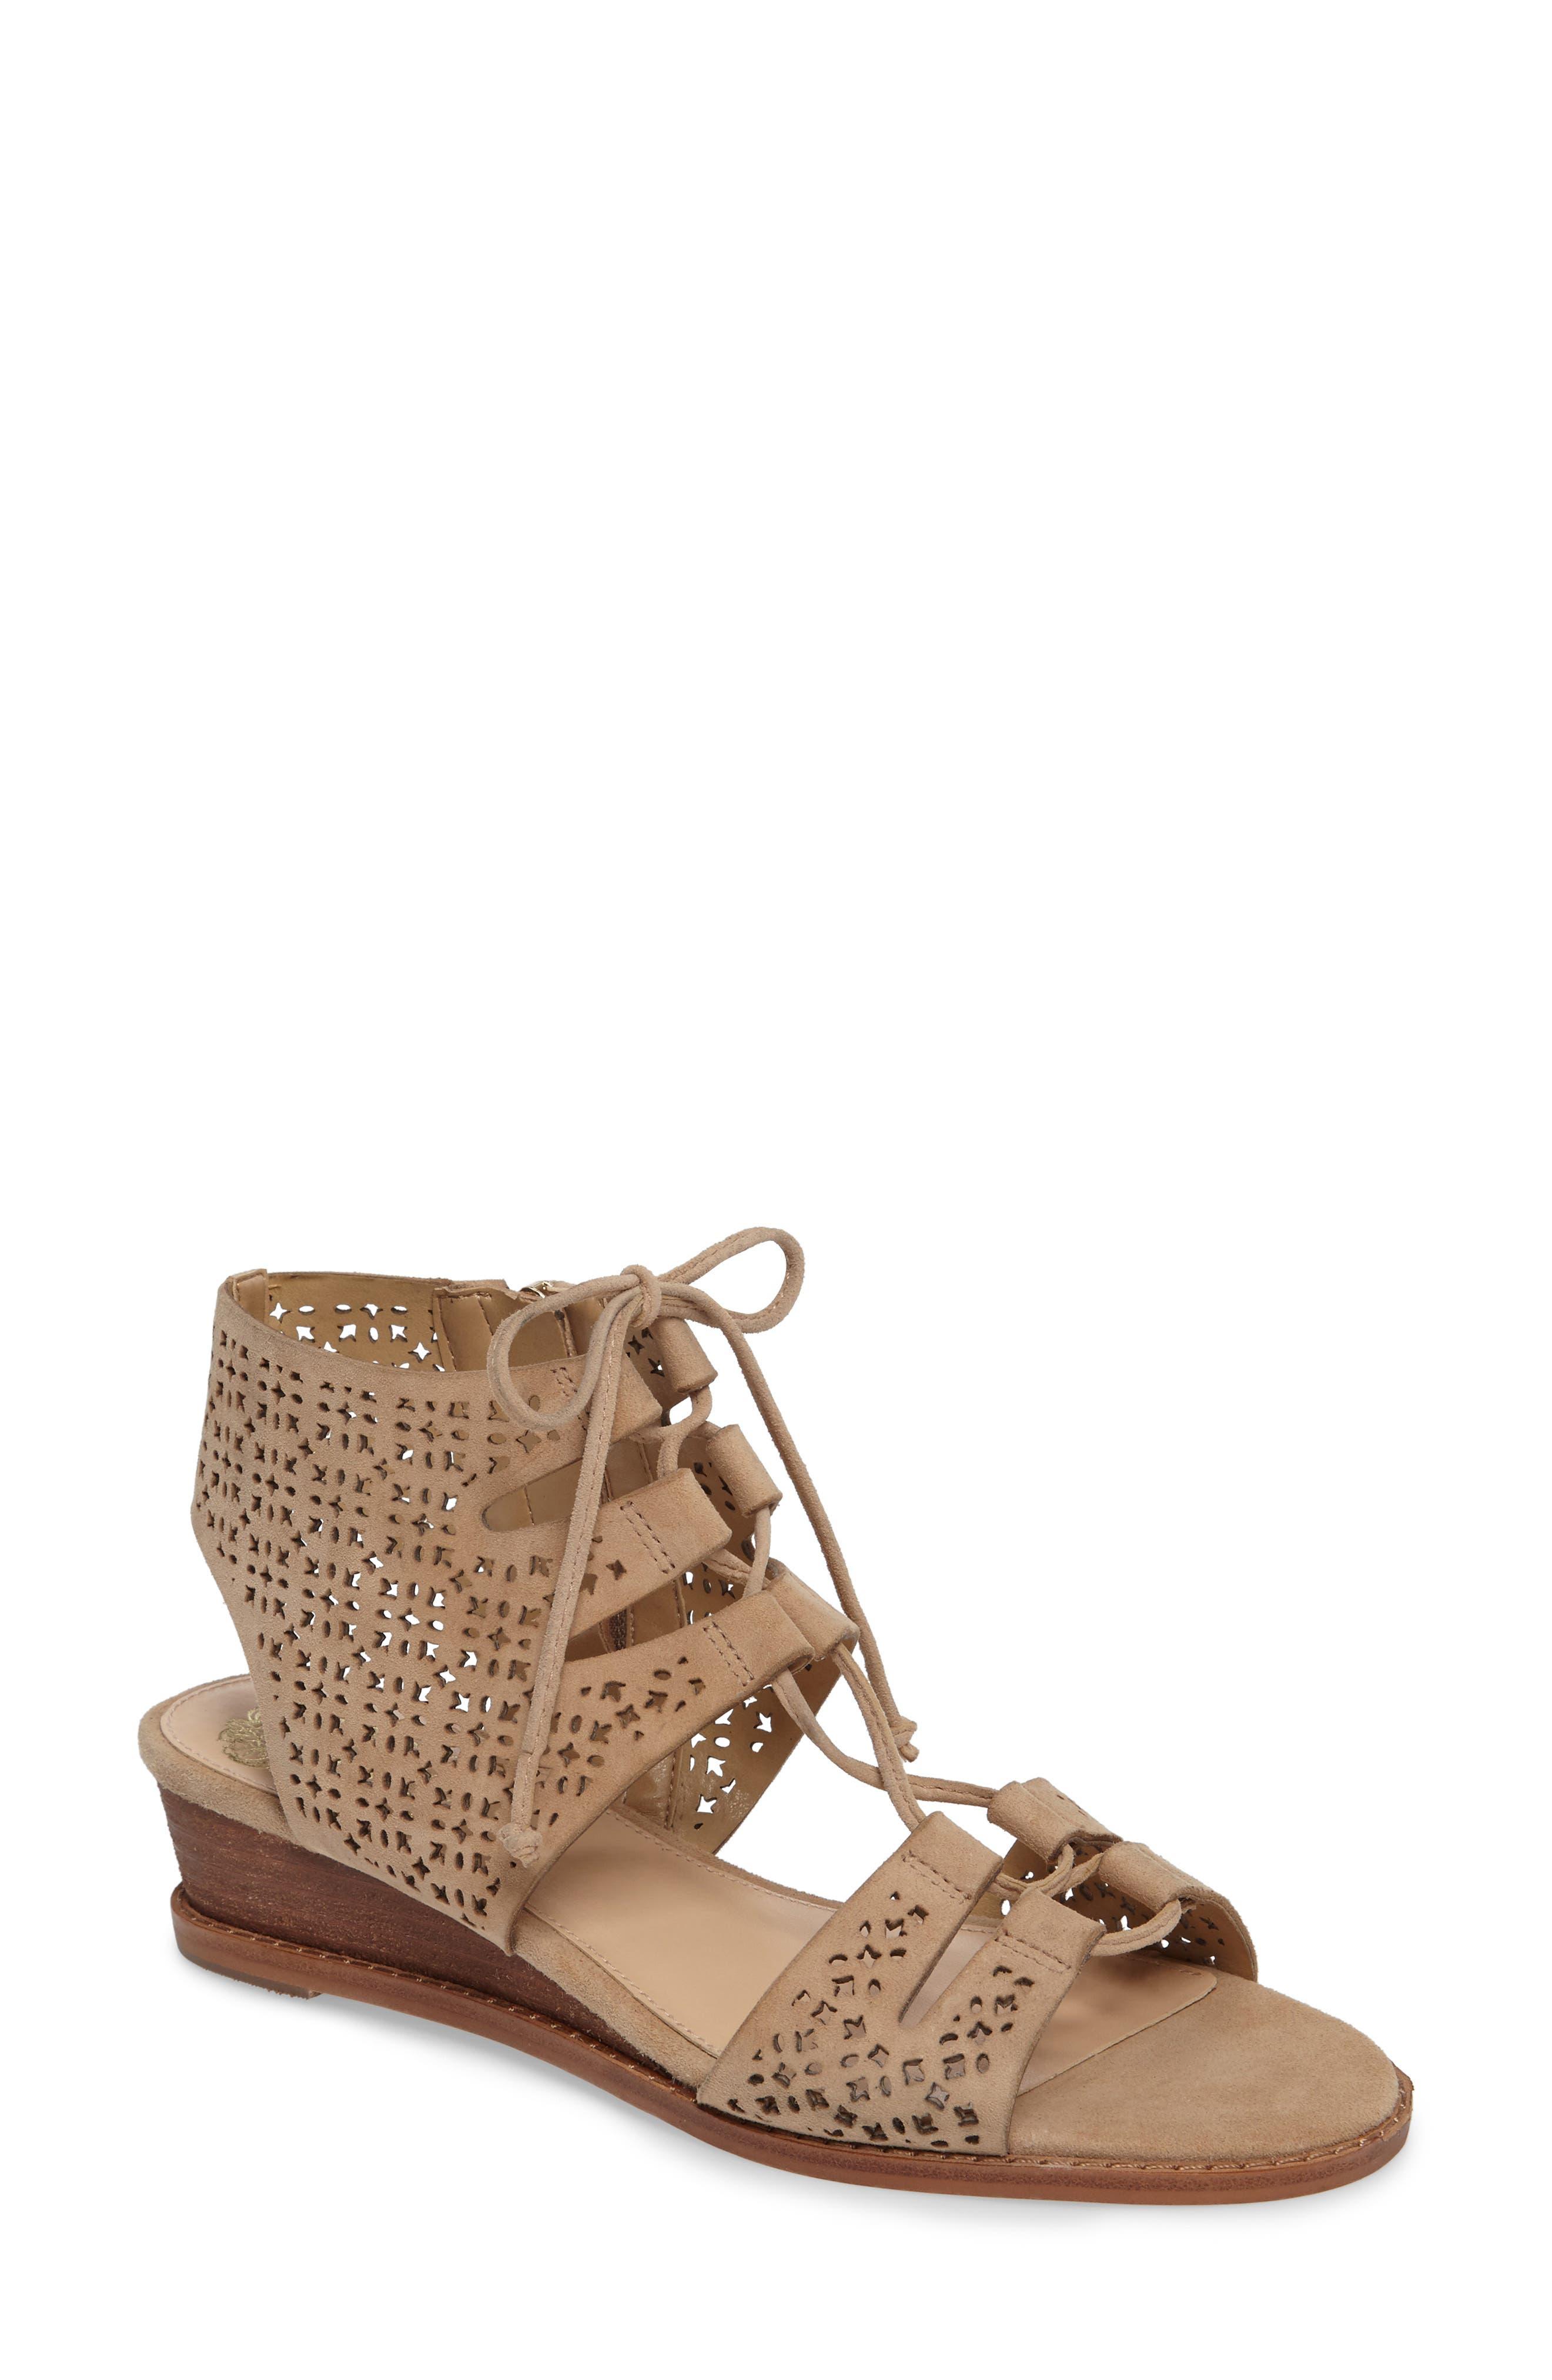 Vince Camuto Retana Perforated Wedge Sandal (Women)